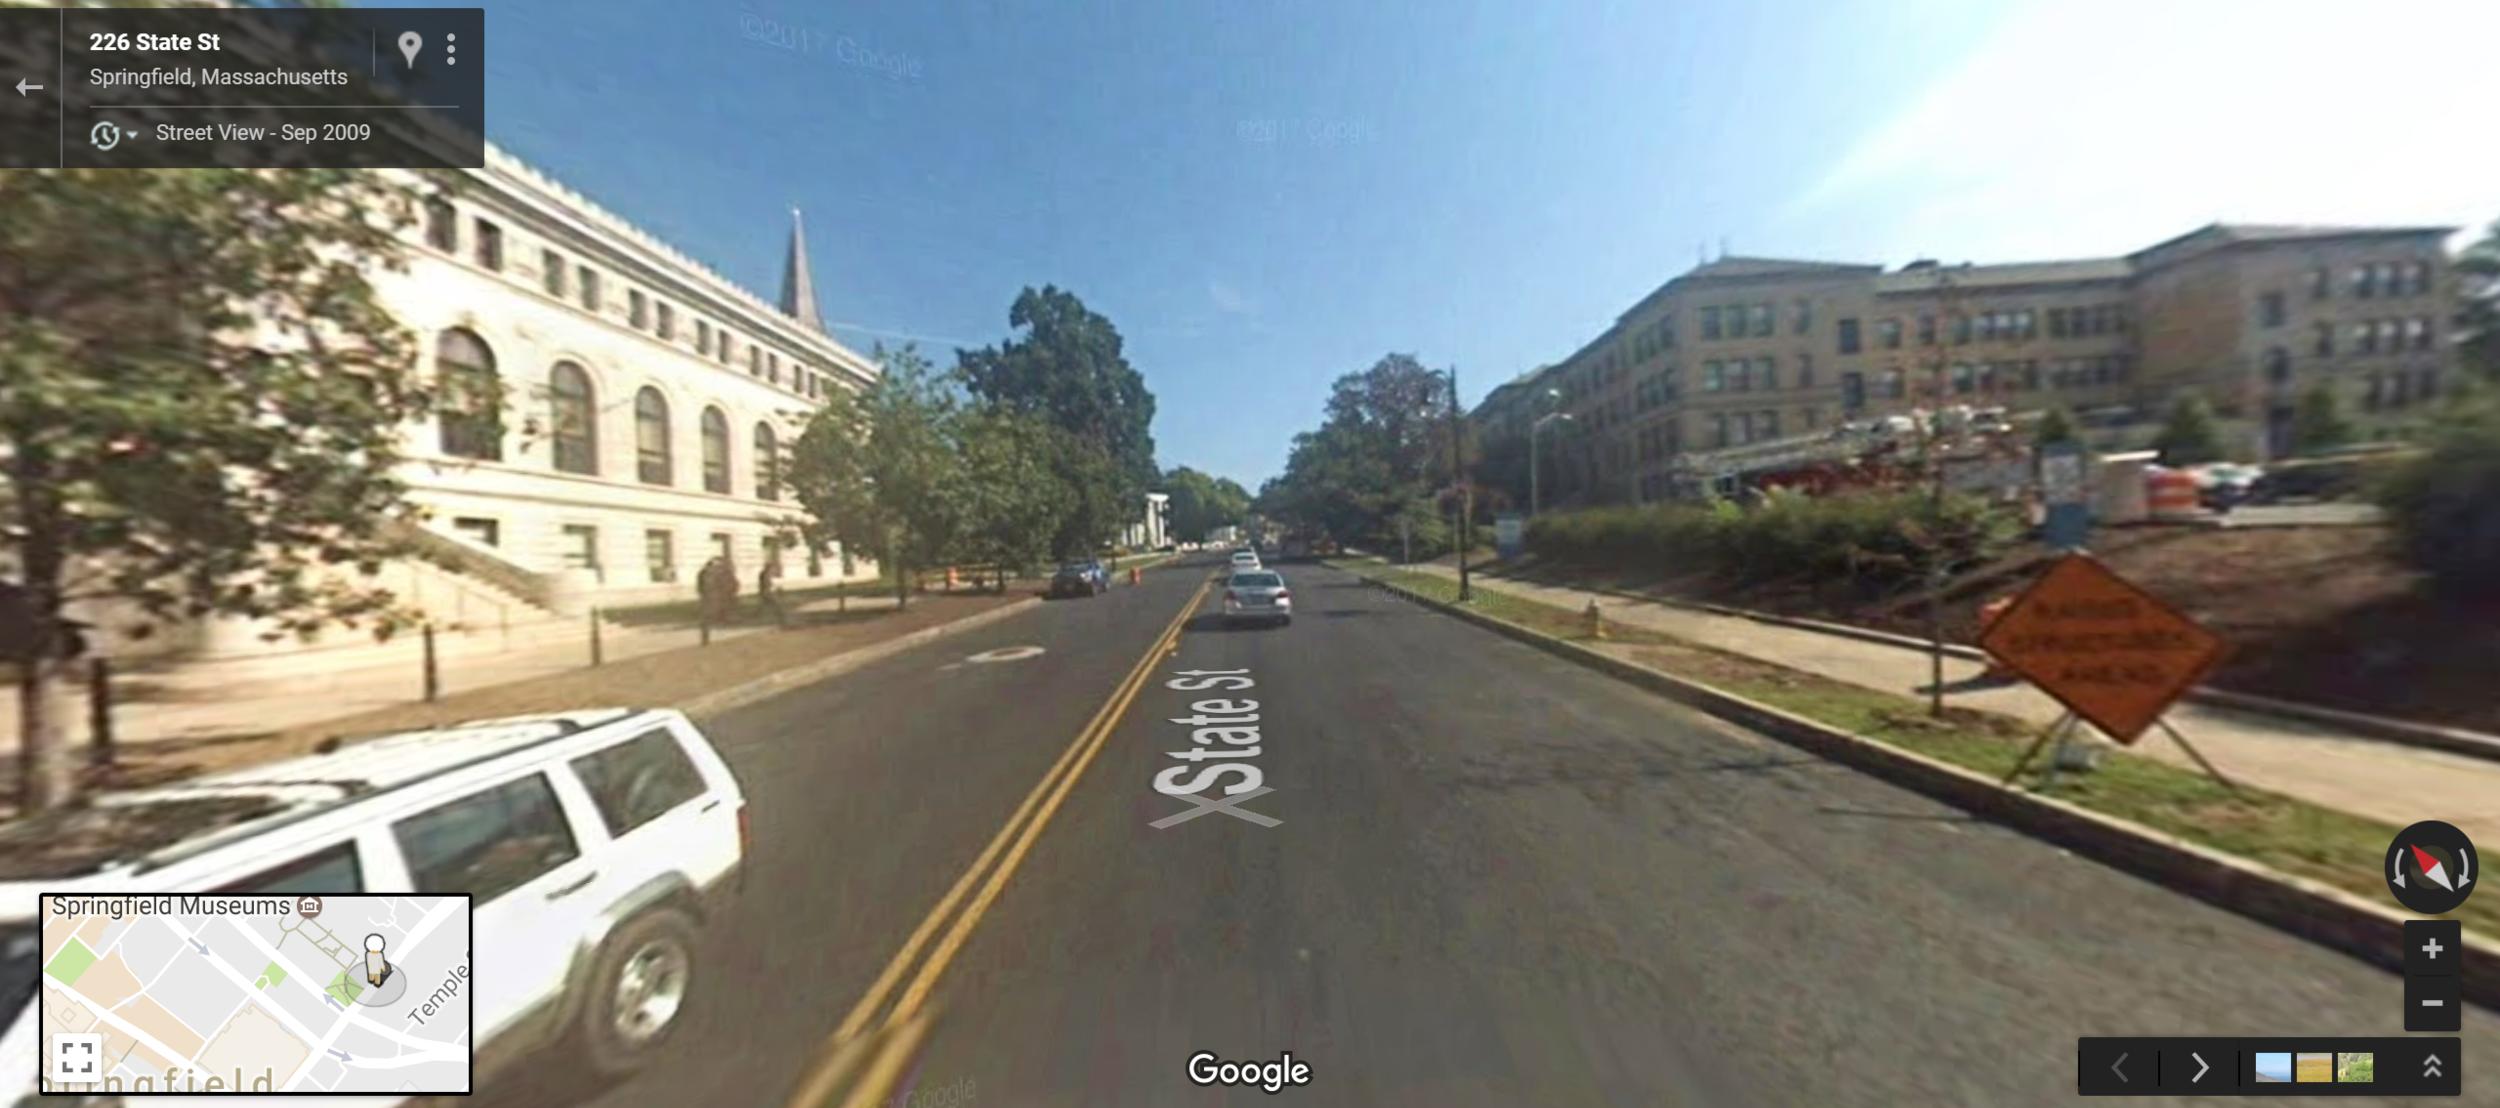 2009 Google Street View